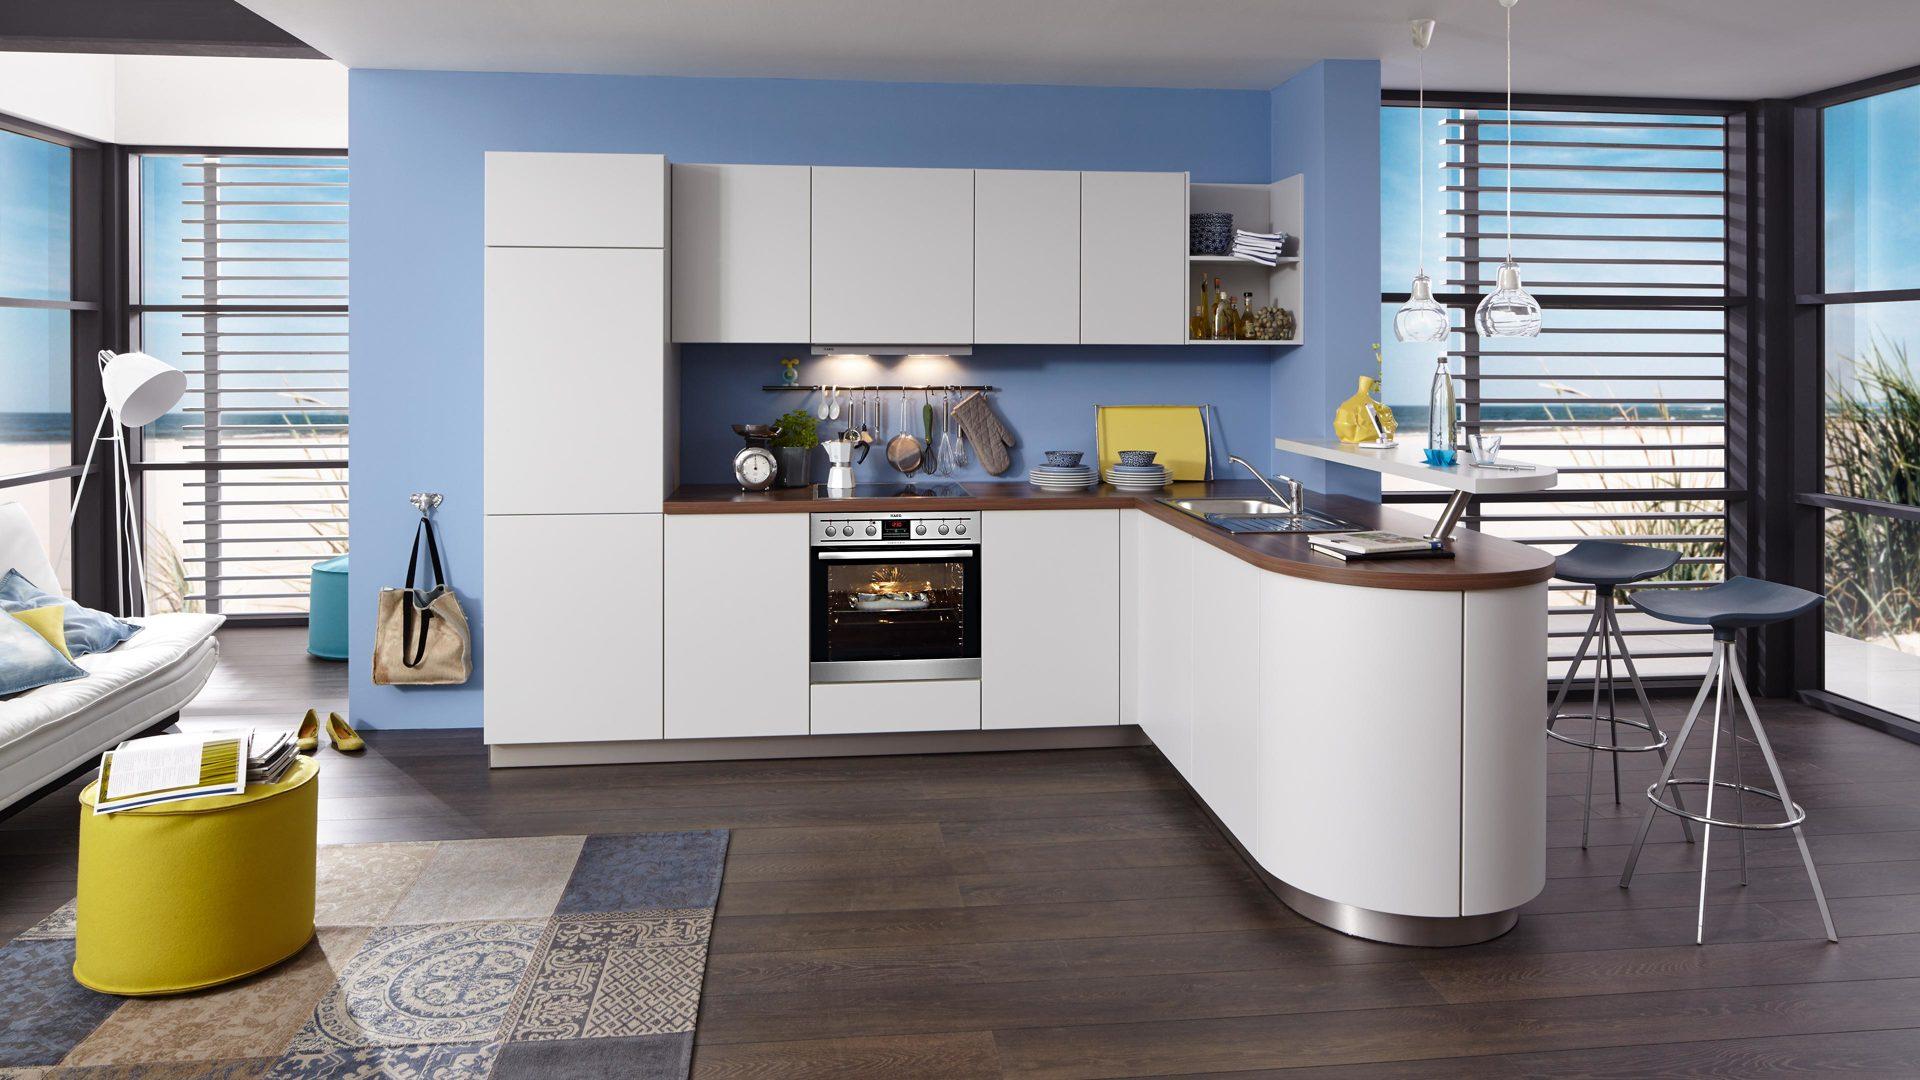 Möbel Boer Coesfeld | Räume | Küche | Einbauküche | Einbauküche ...